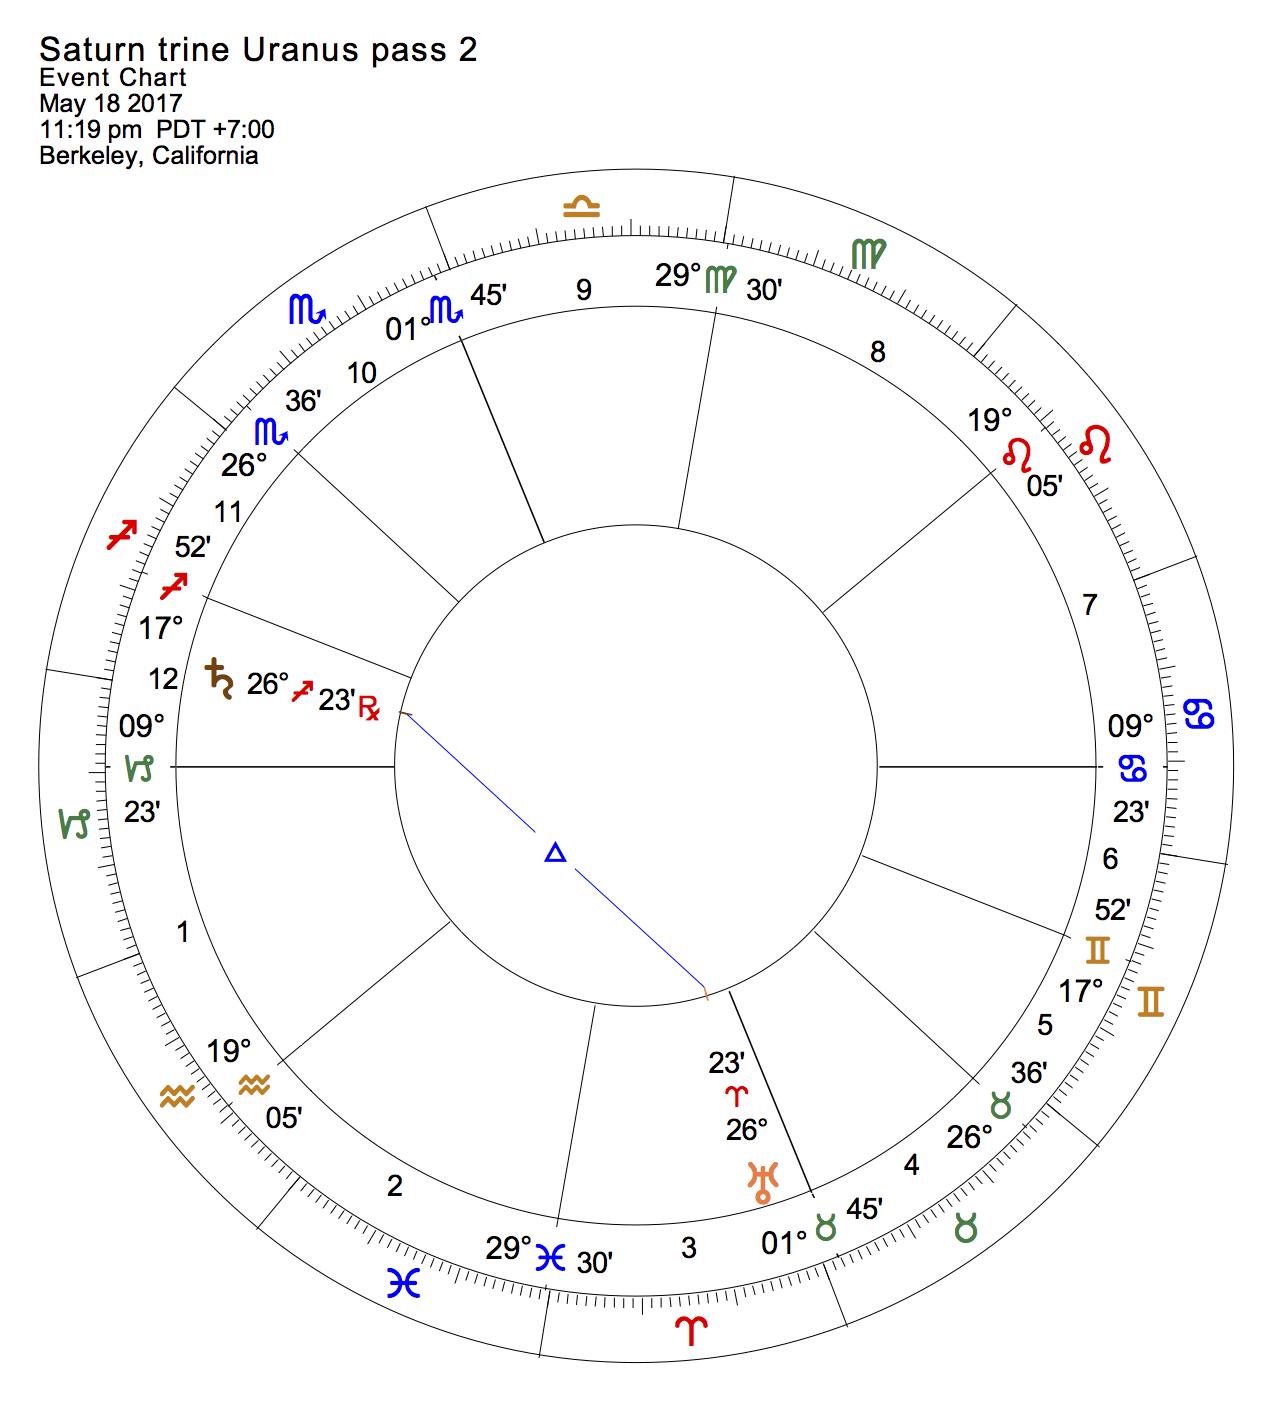 Saturn trine Uranus pass 2